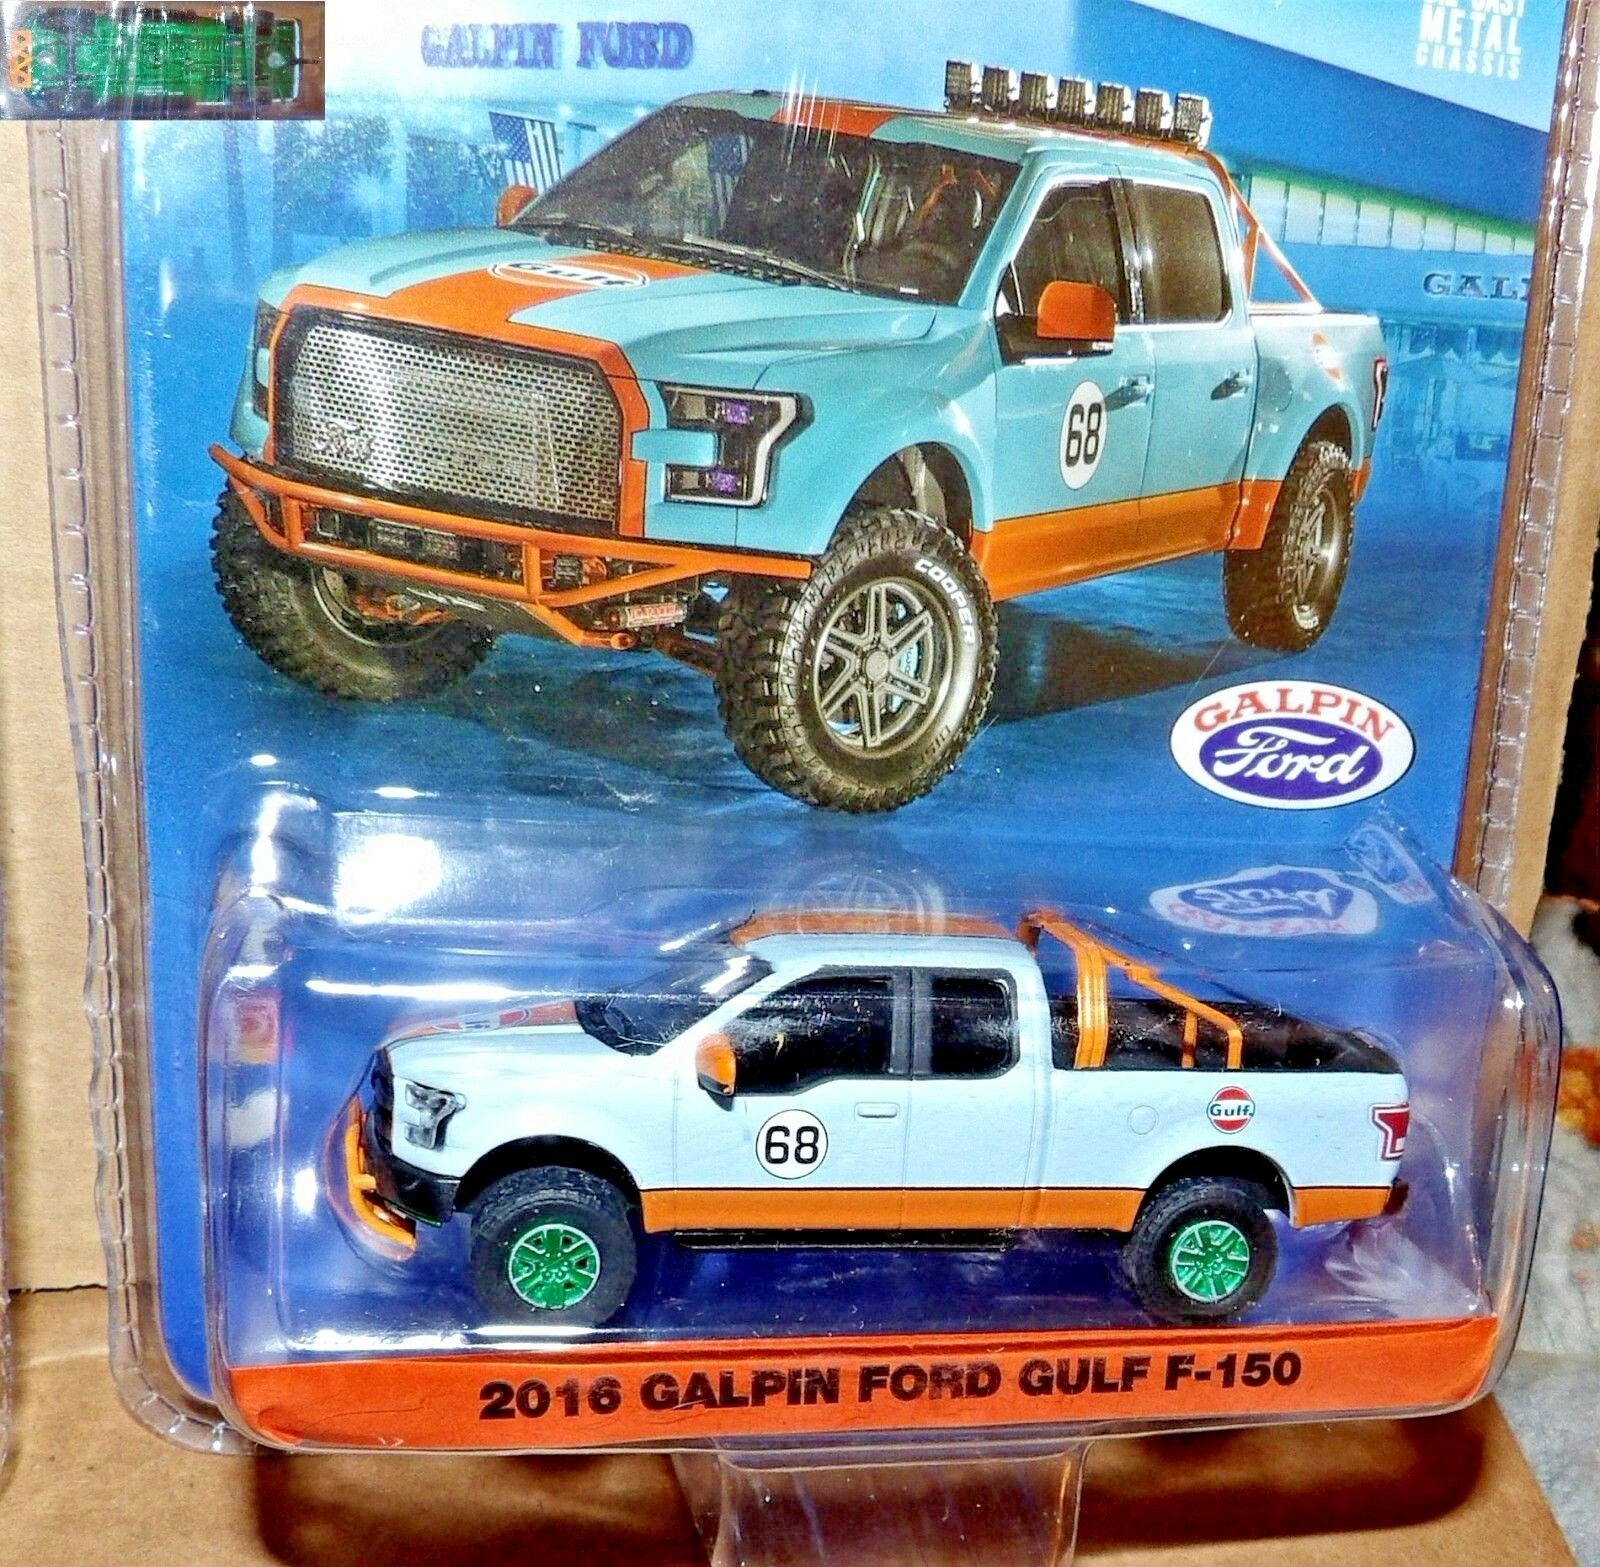 Grünlight Galpin Ford F150 2016 Gulf 1 64 51088 Grün CHASE promo